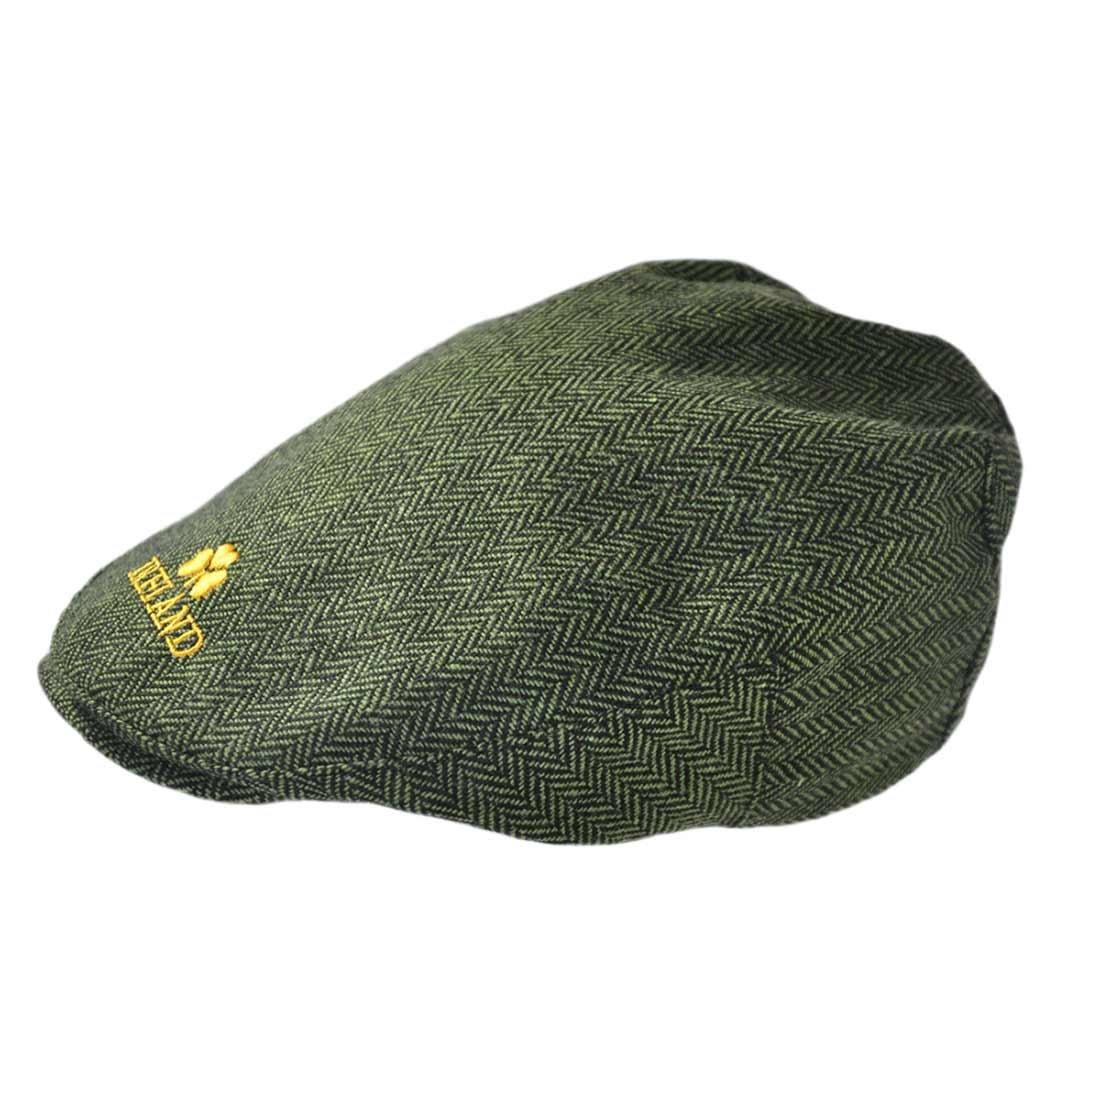 Carrolls Irish Gifts Green Tweed Cap with Yellow Ireland Emblem